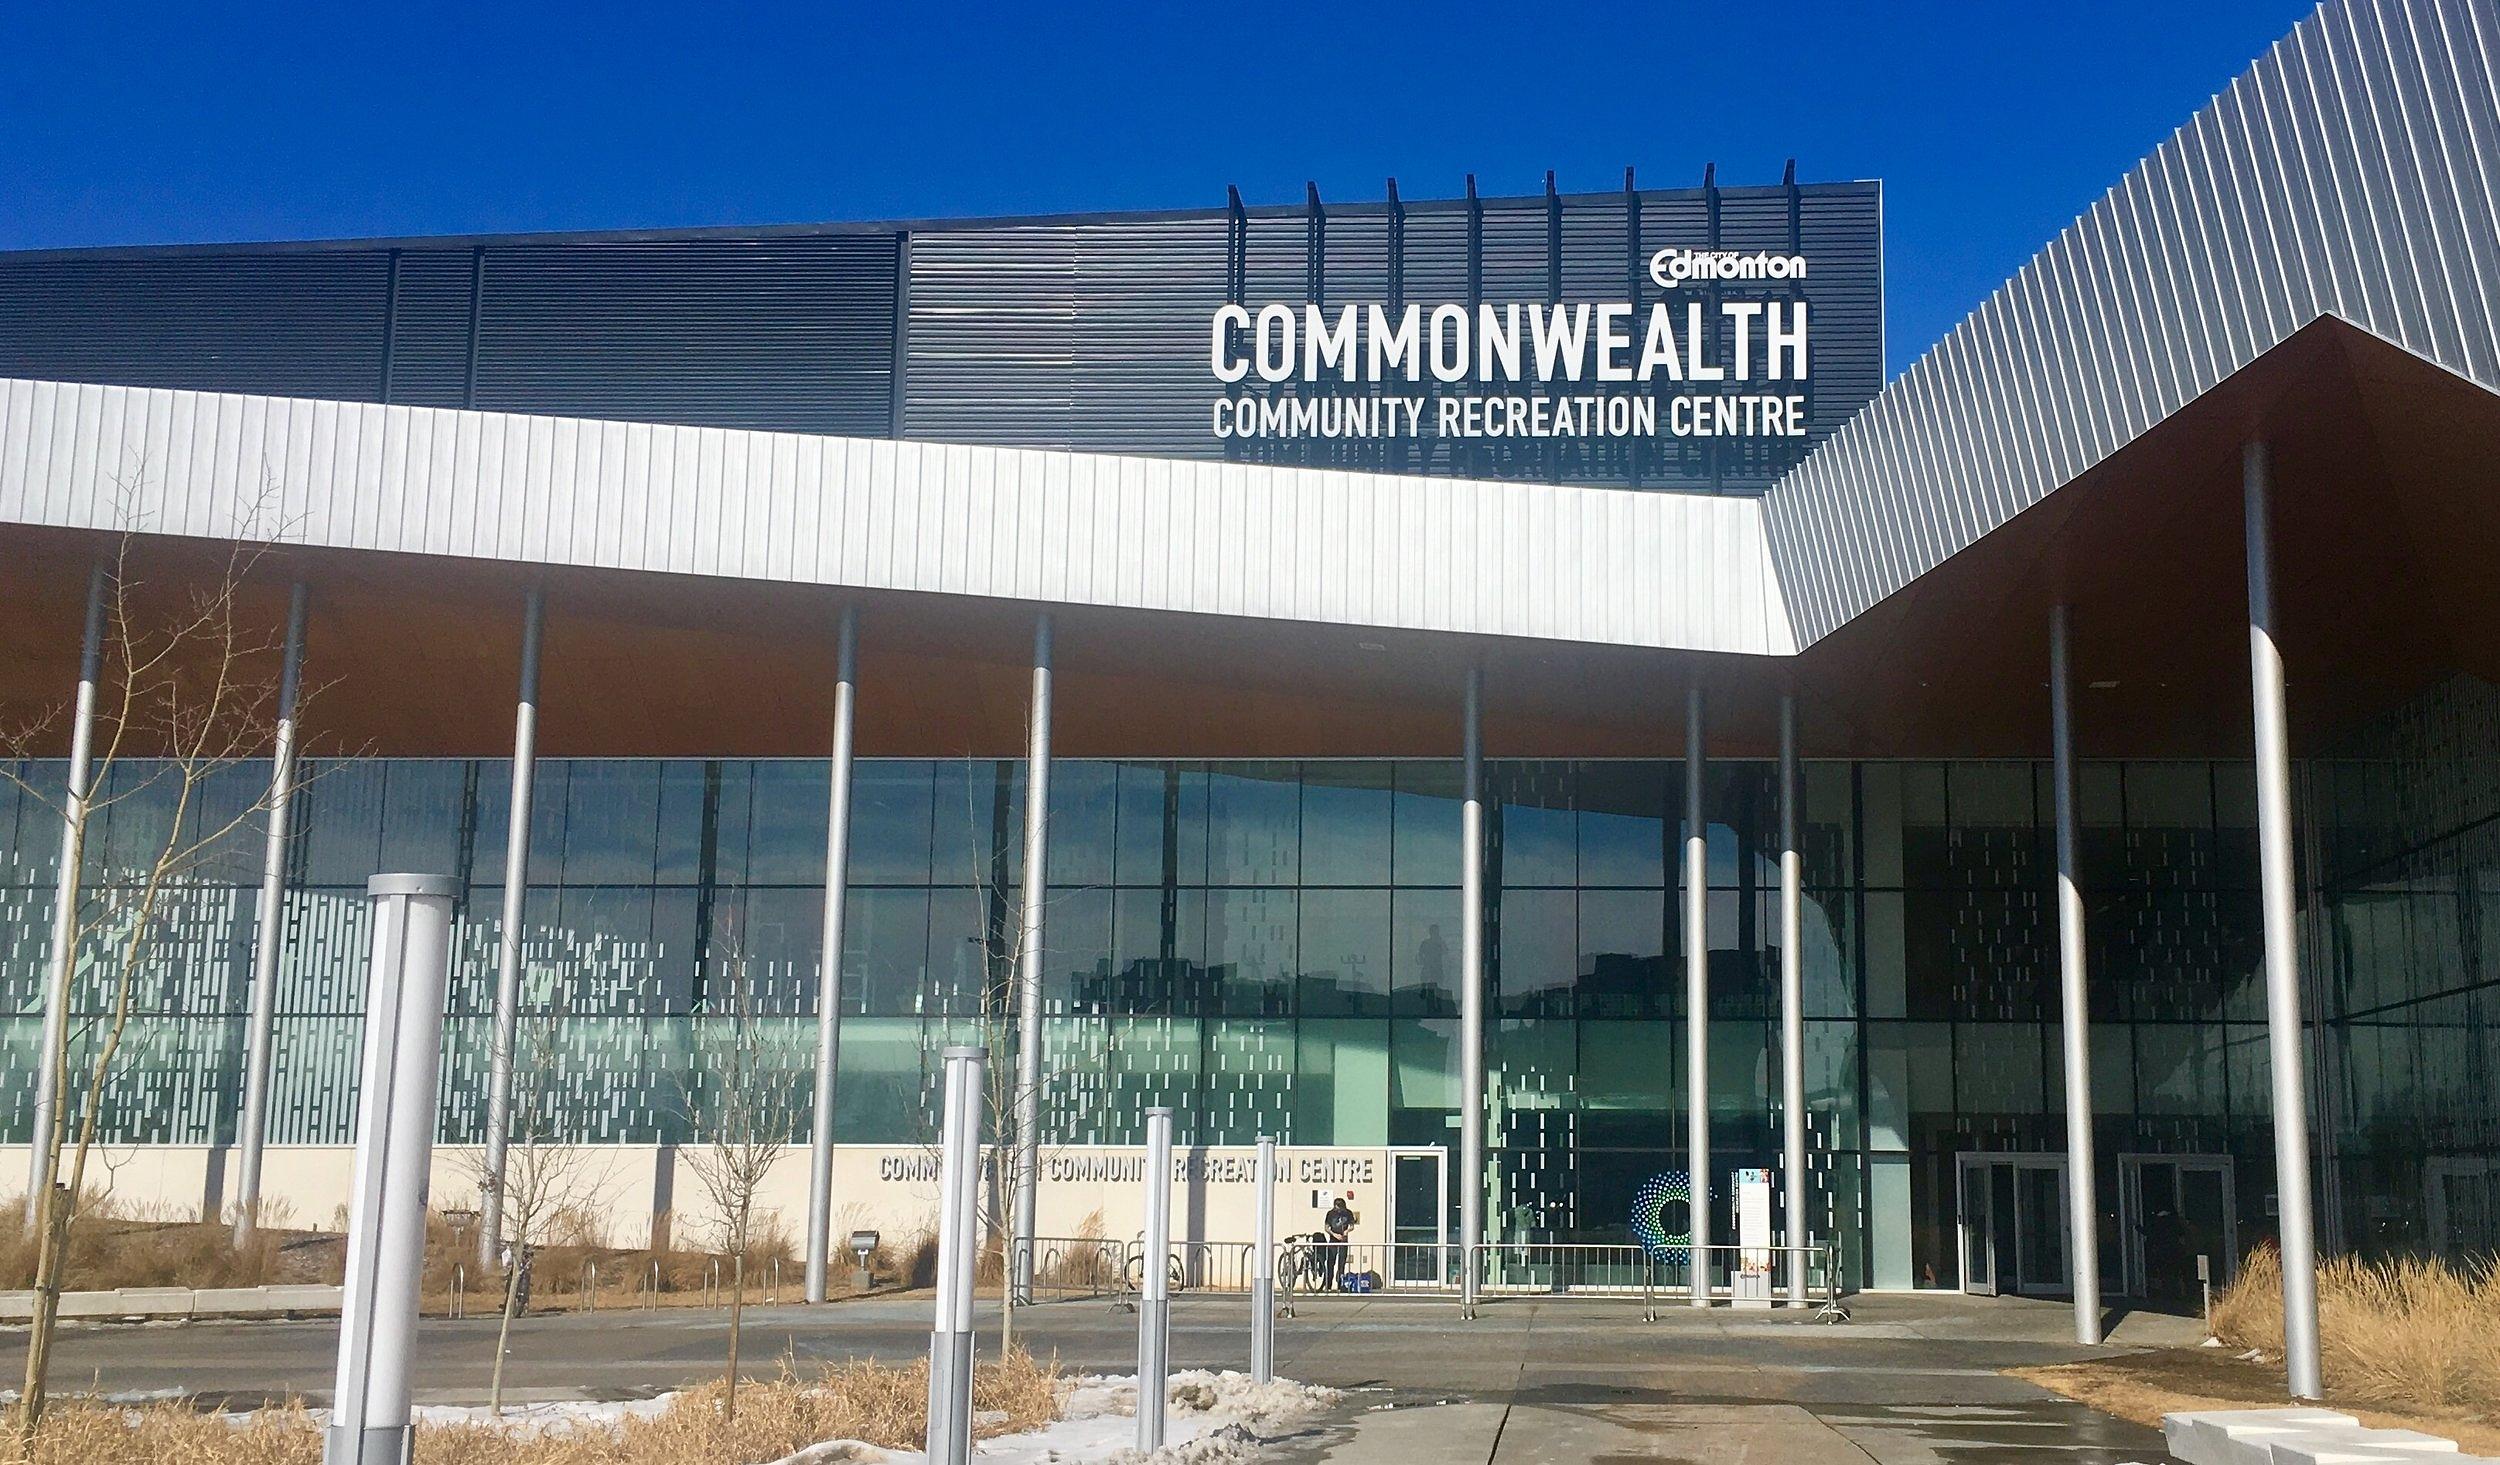 CommonwealthCommunityRecreationCentre.jpg